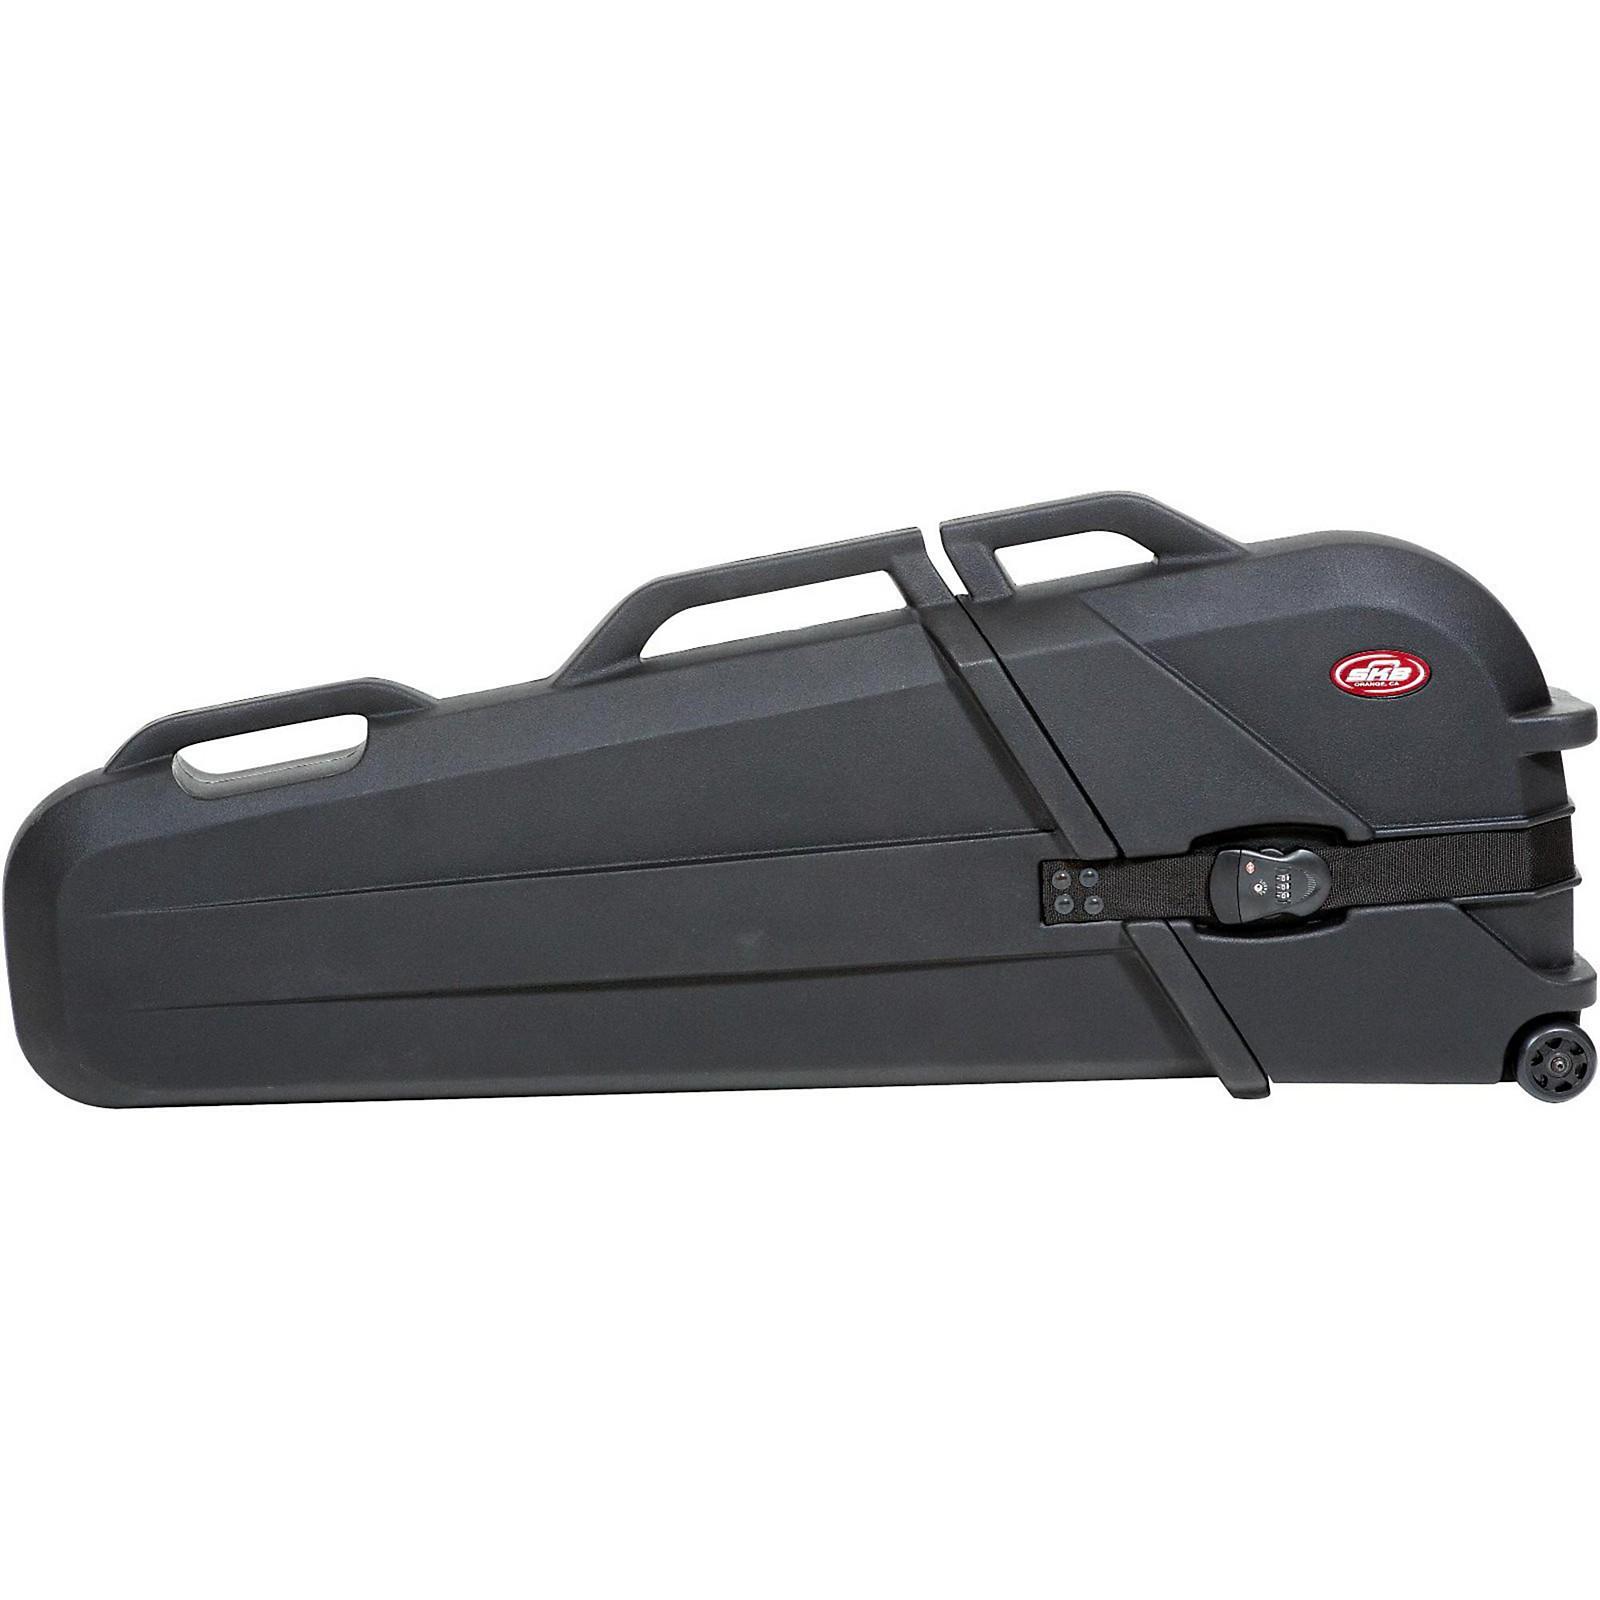 Open Box SKB SKB-44RW ATA Electric Bass Roller Case